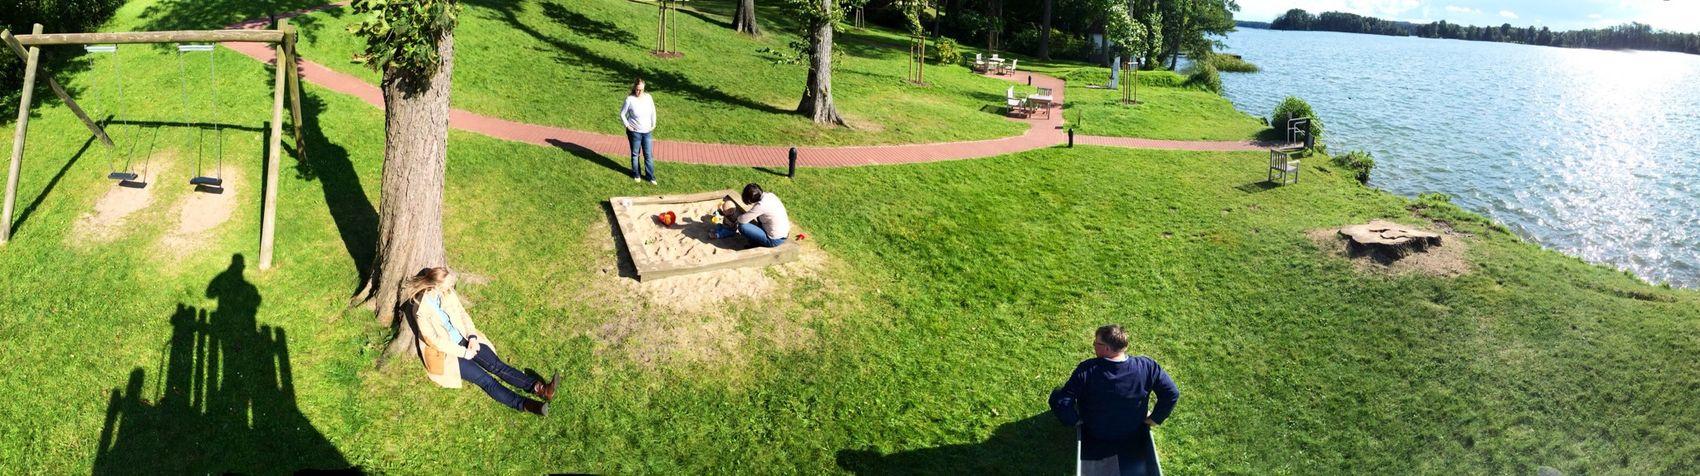 Familylife Panorama Playground